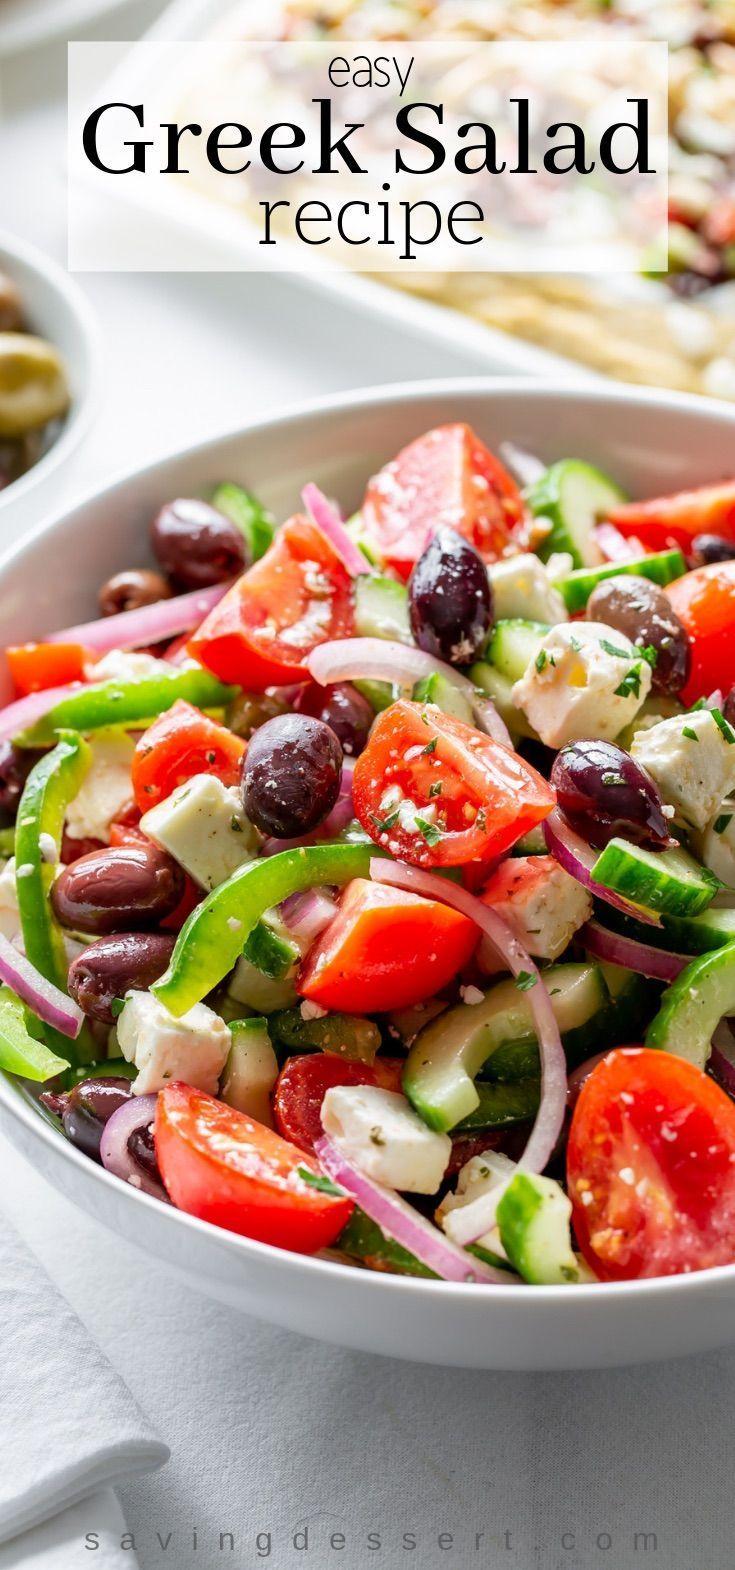 Easy Greek Salad Recipe - Saving Room for Dessert